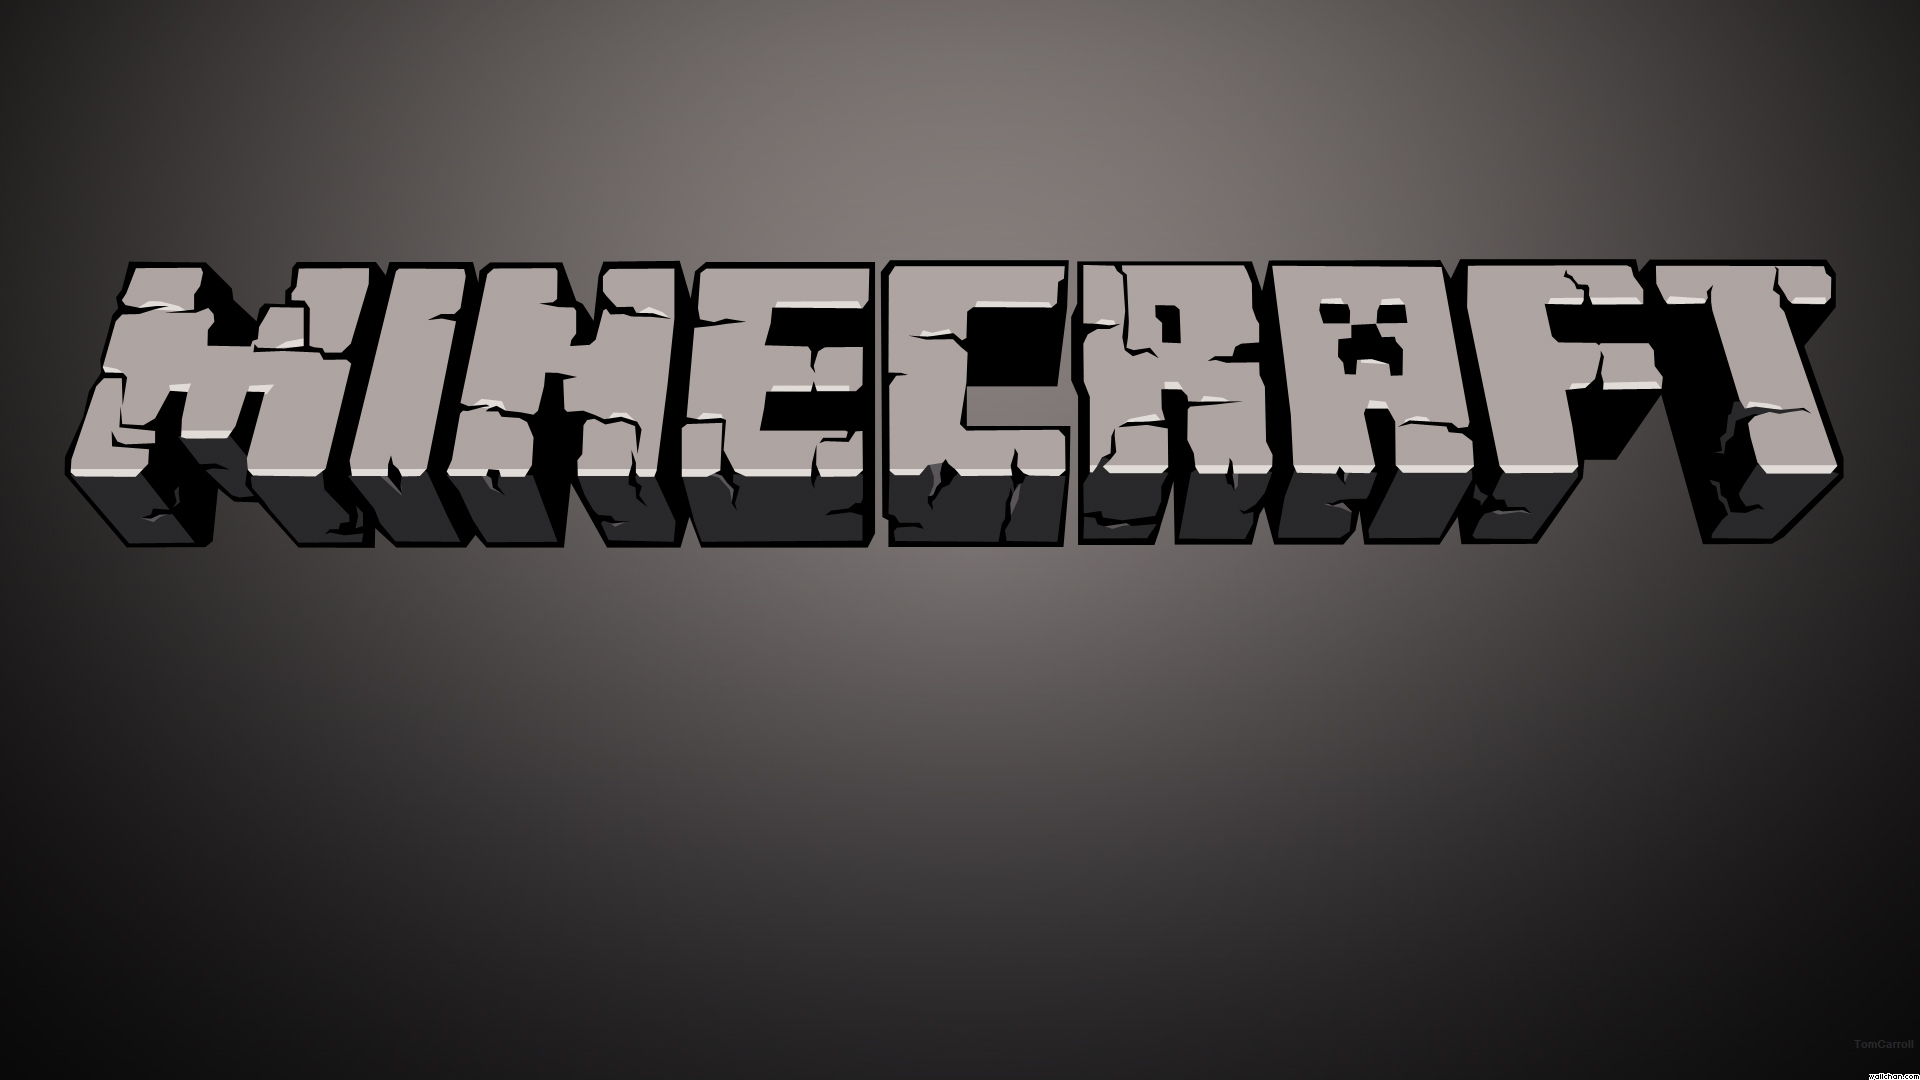 Minecraft Title Wallpaper   Minecraft Wallpaper 39645298 1920x1080